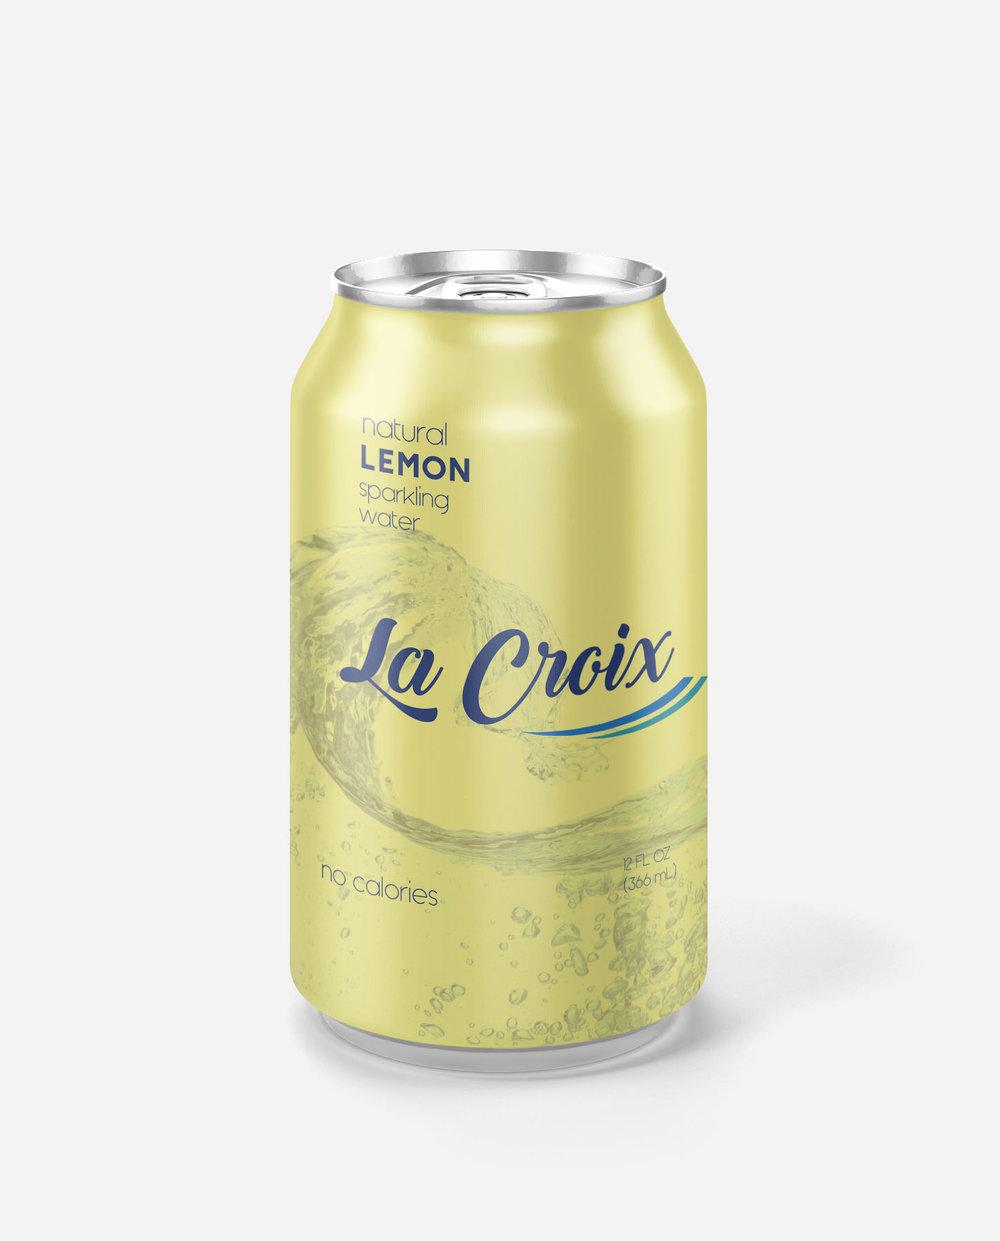 lacroix_lemon.jpg